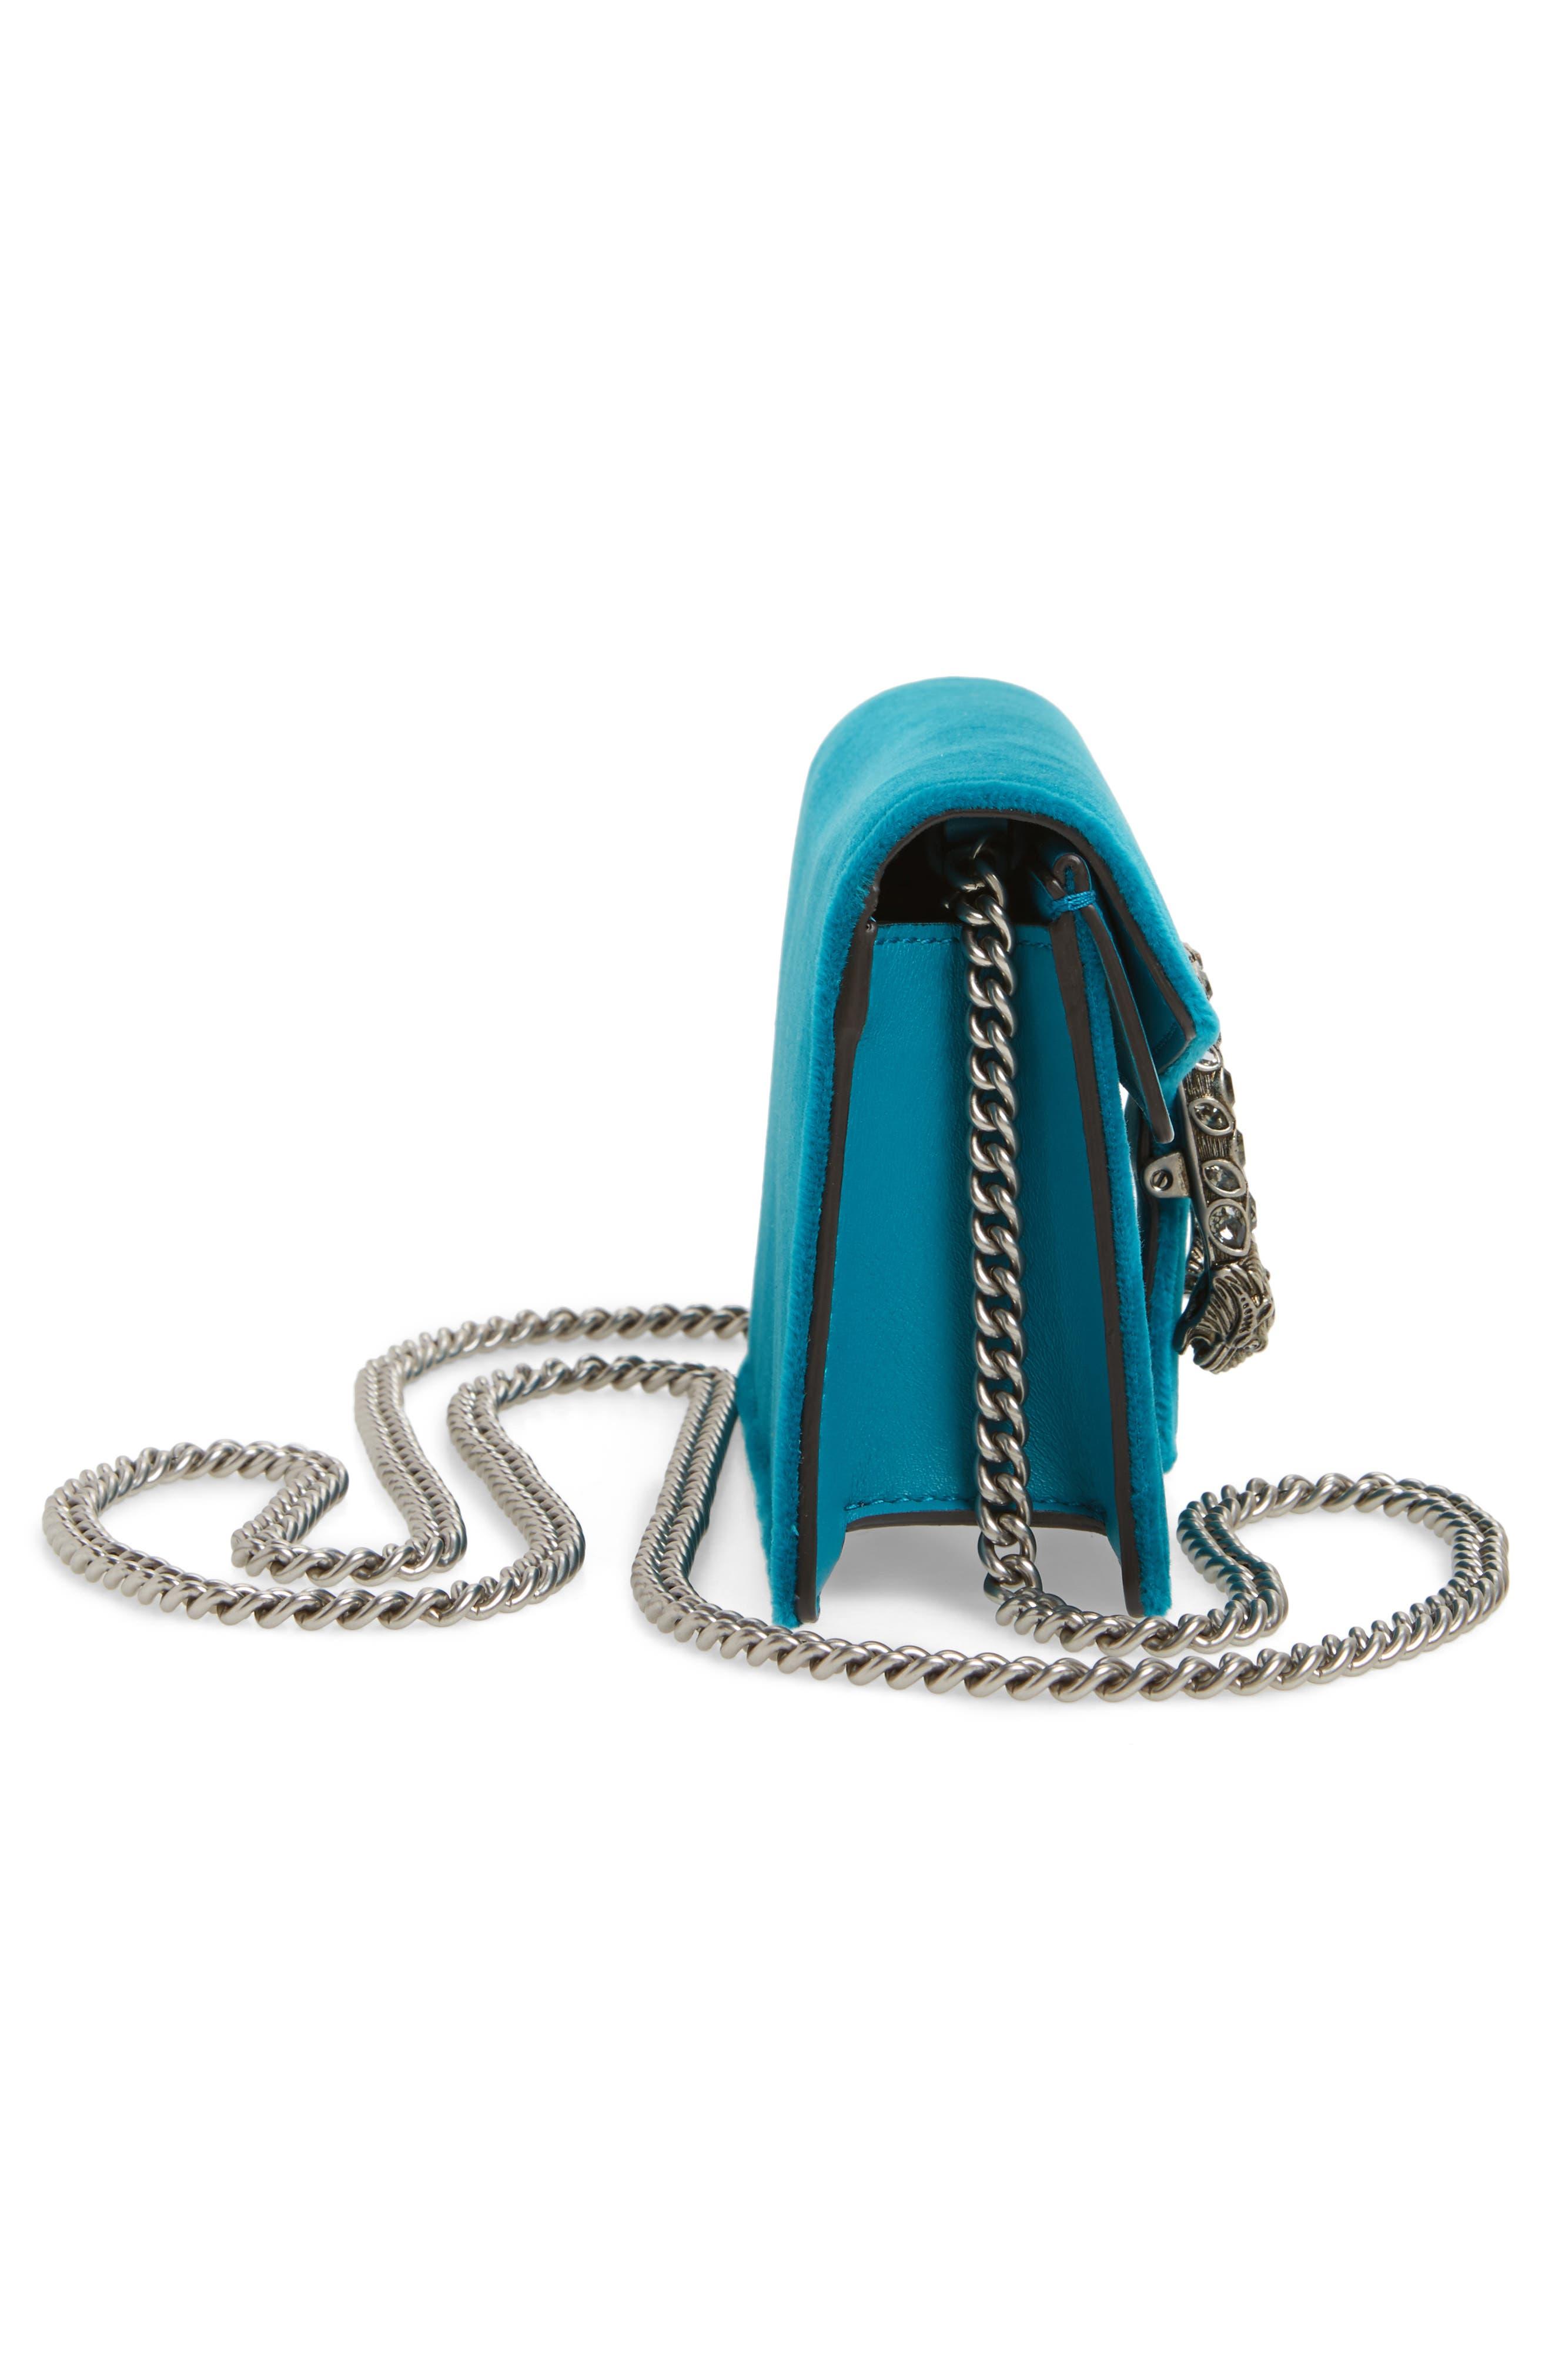 GUCCI, Super Mini Dionysus Velvet Shoulder Bag, Alternate thumbnail 5, color, PIVONE